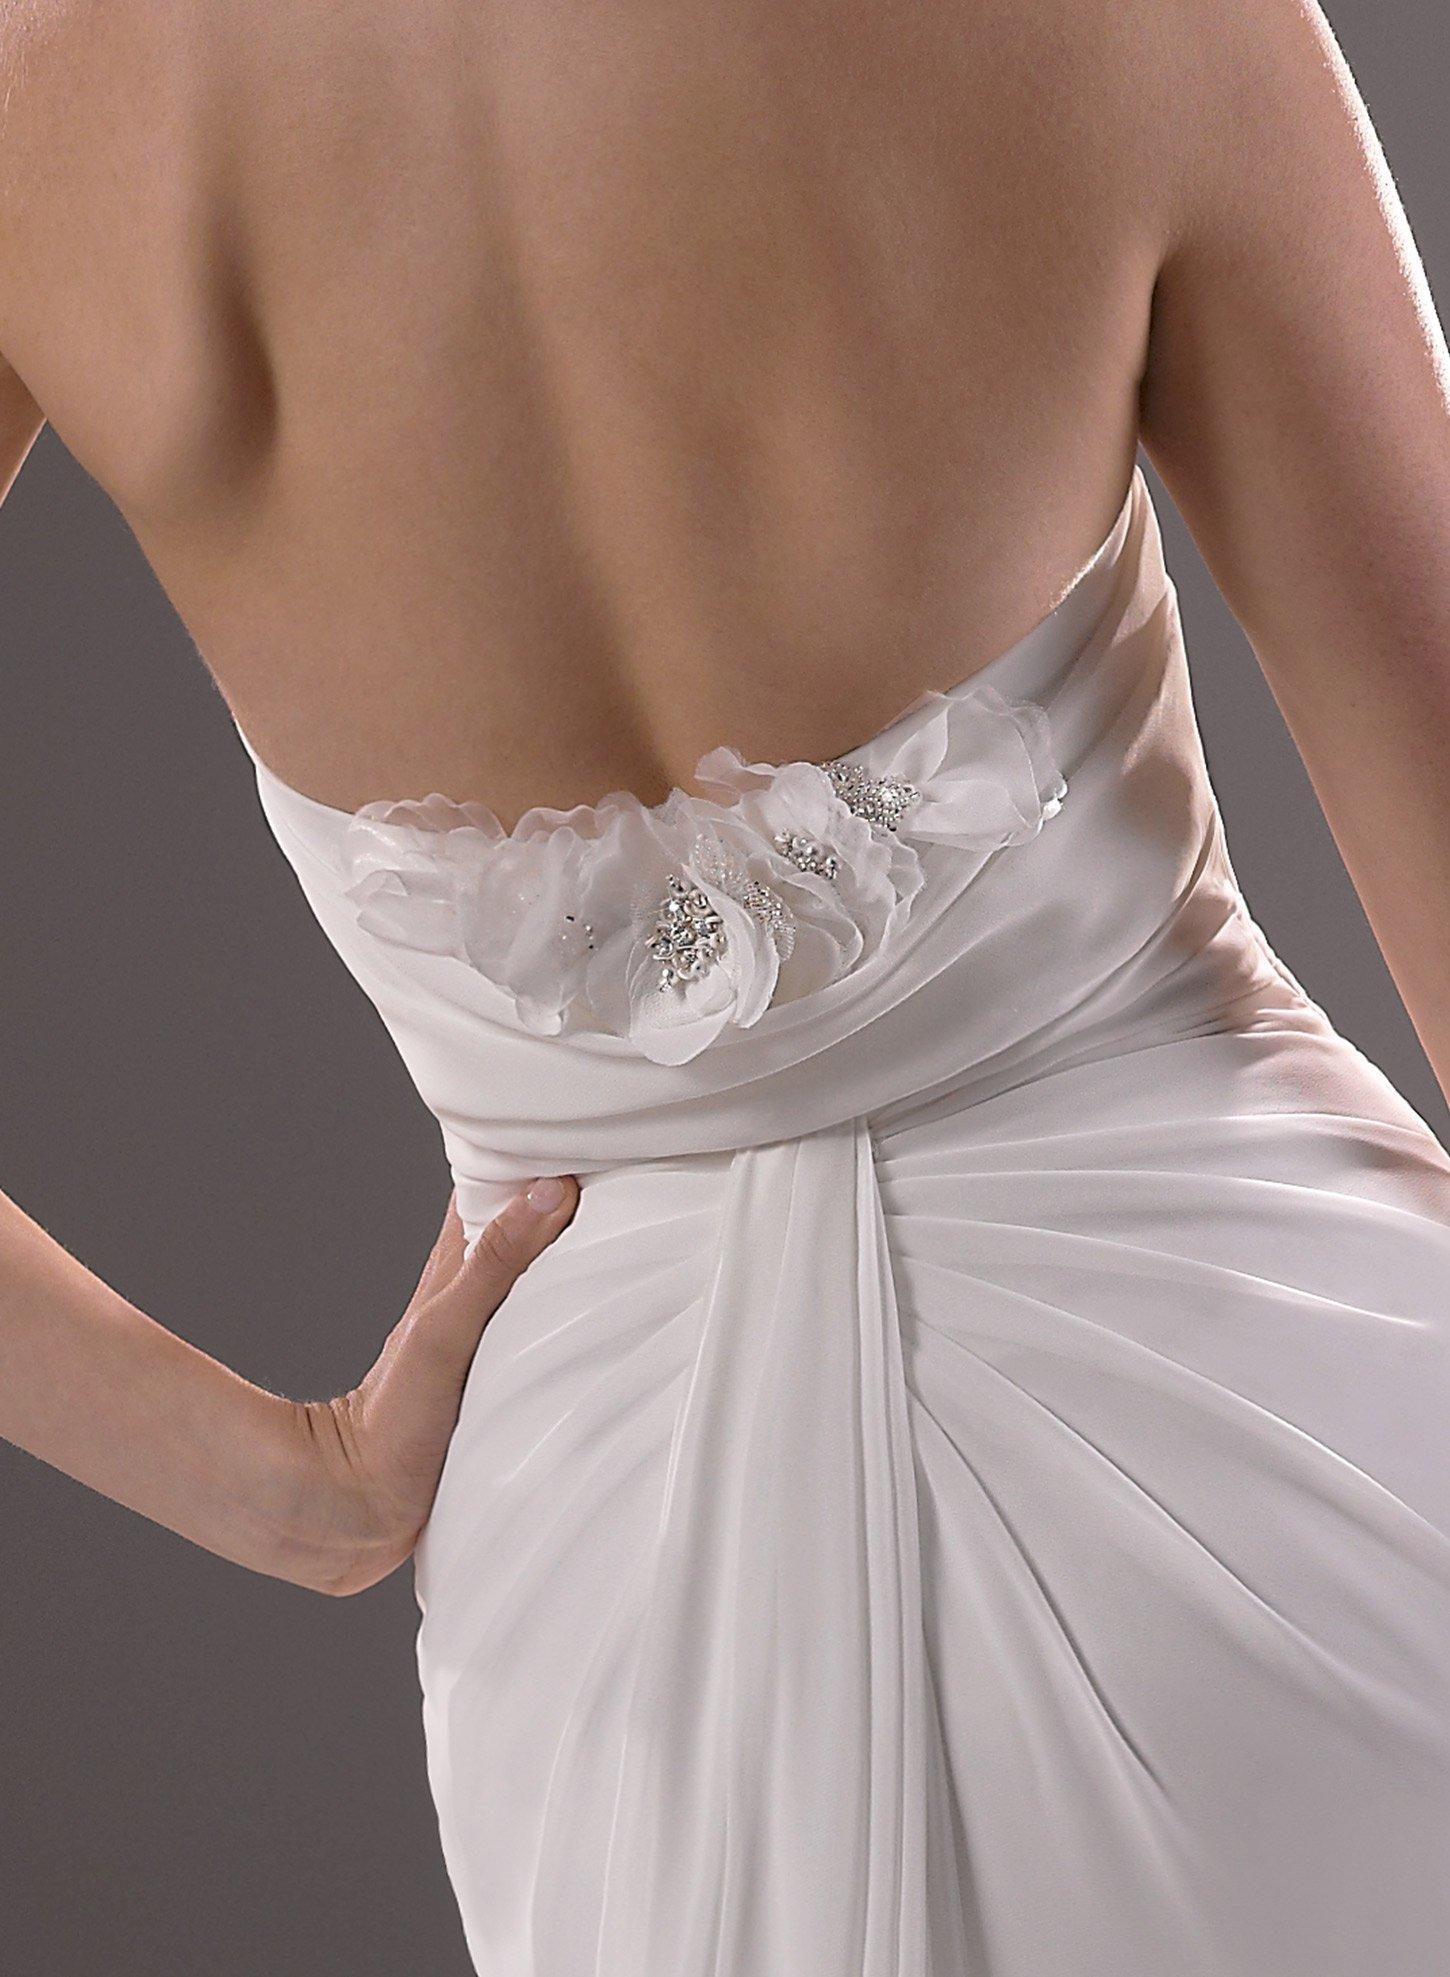 RILLEY suknia ślubna - Suknie ślubne